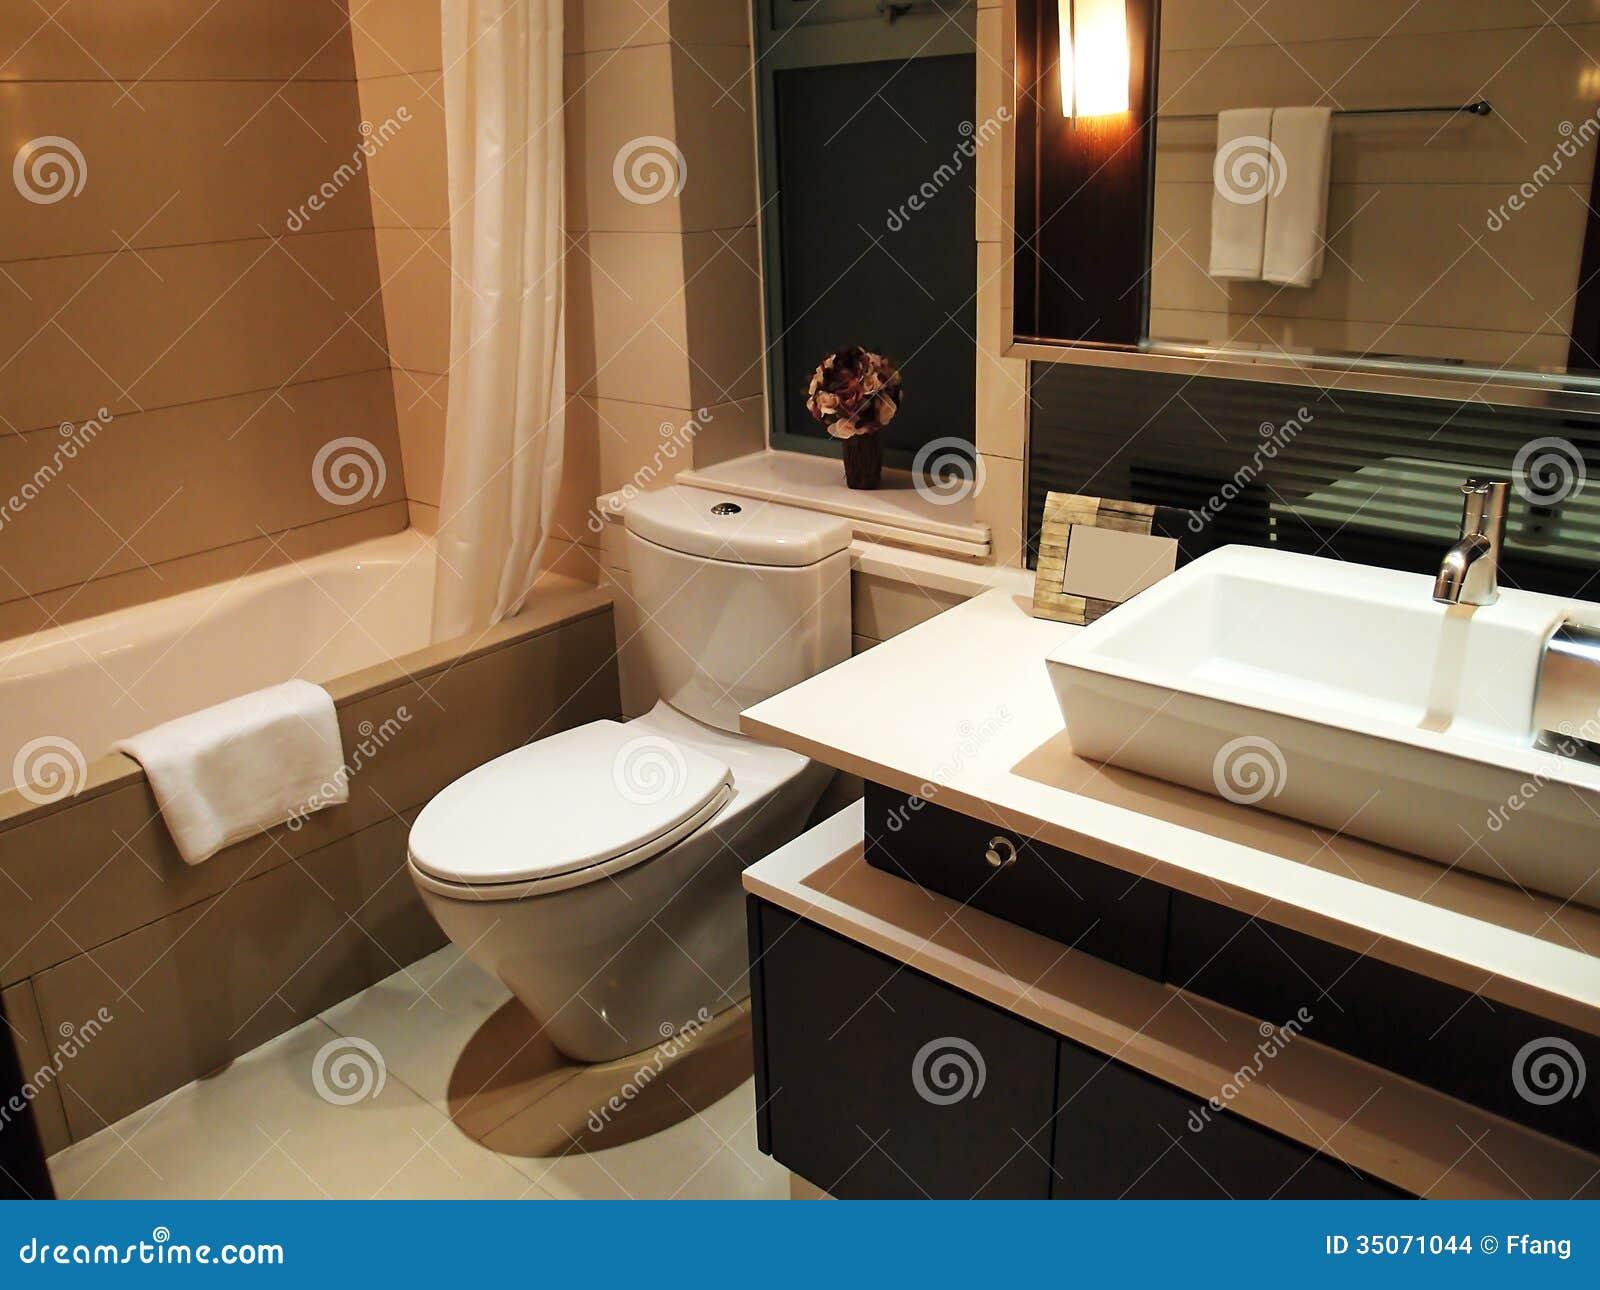 Luxury Toilet Stock Images Image 35071044